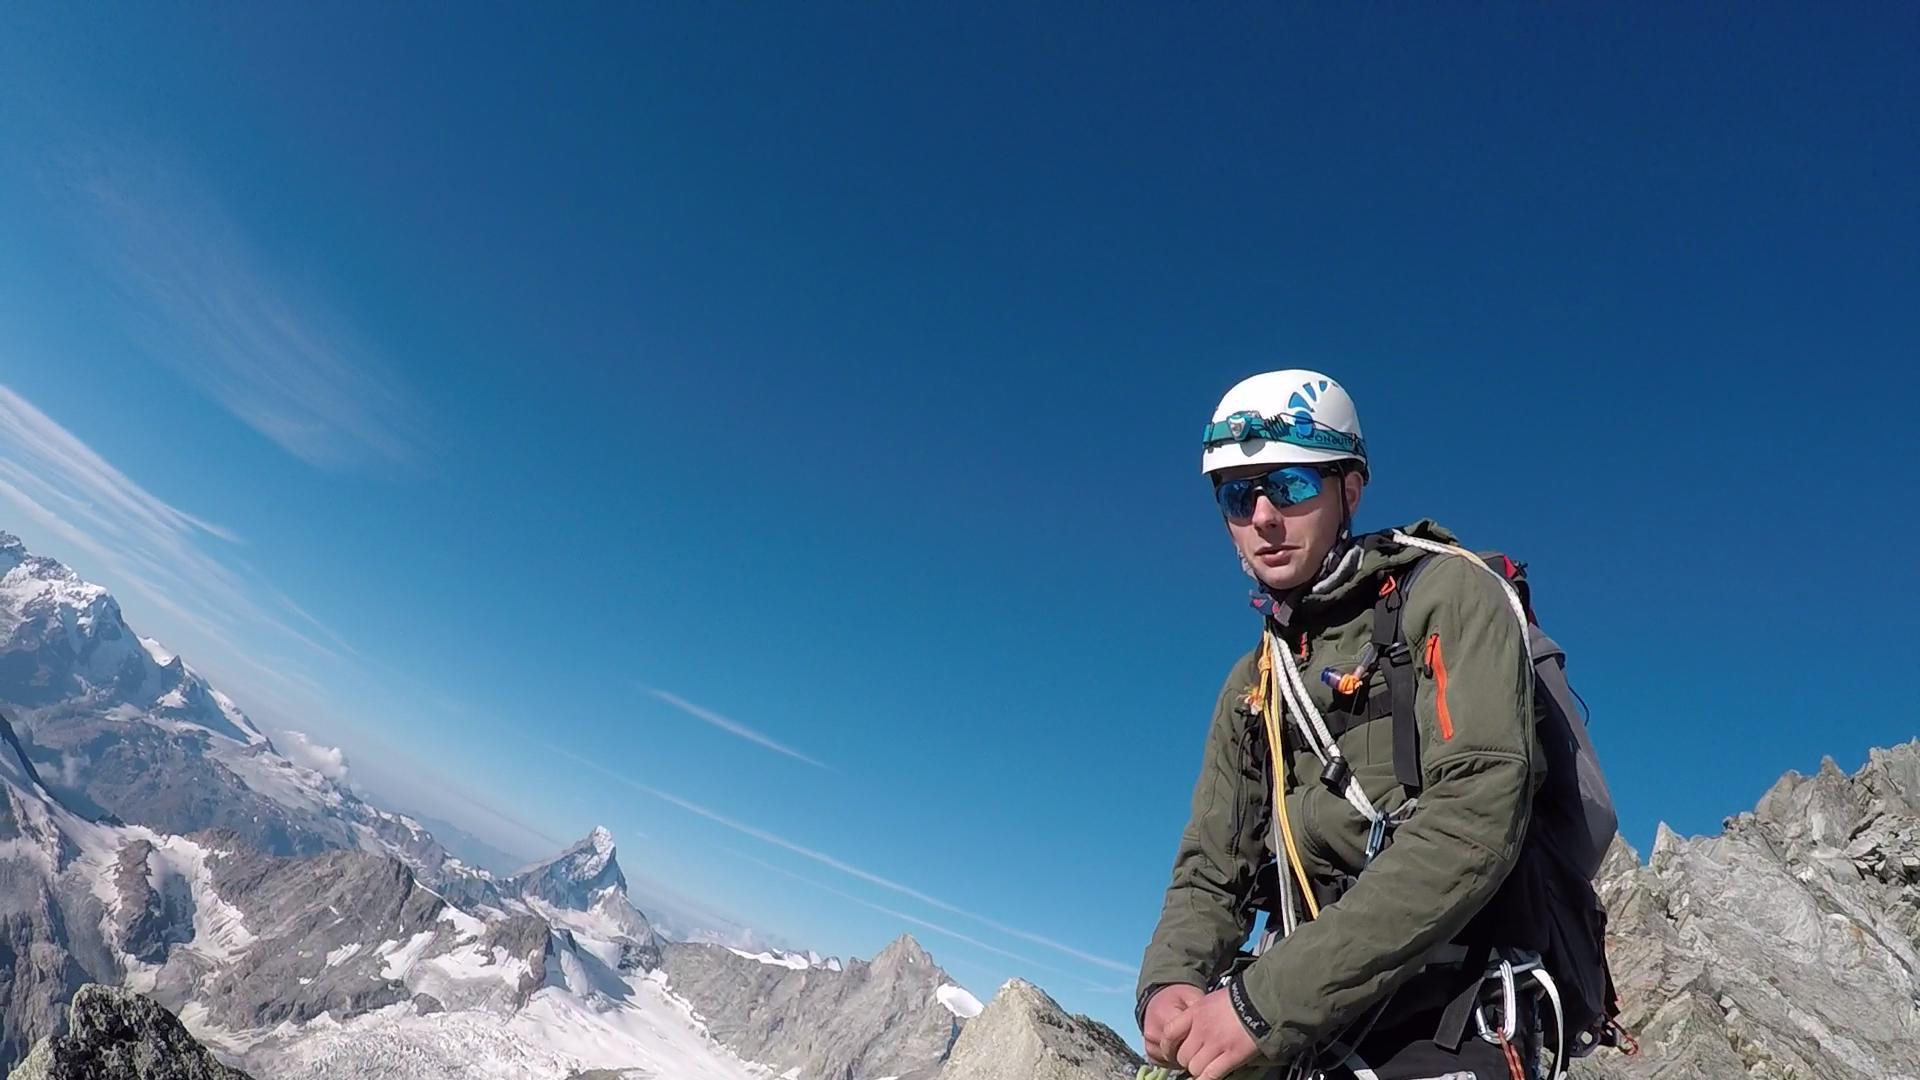 Sebastian auf Lochmatterturm mit Matterhorn